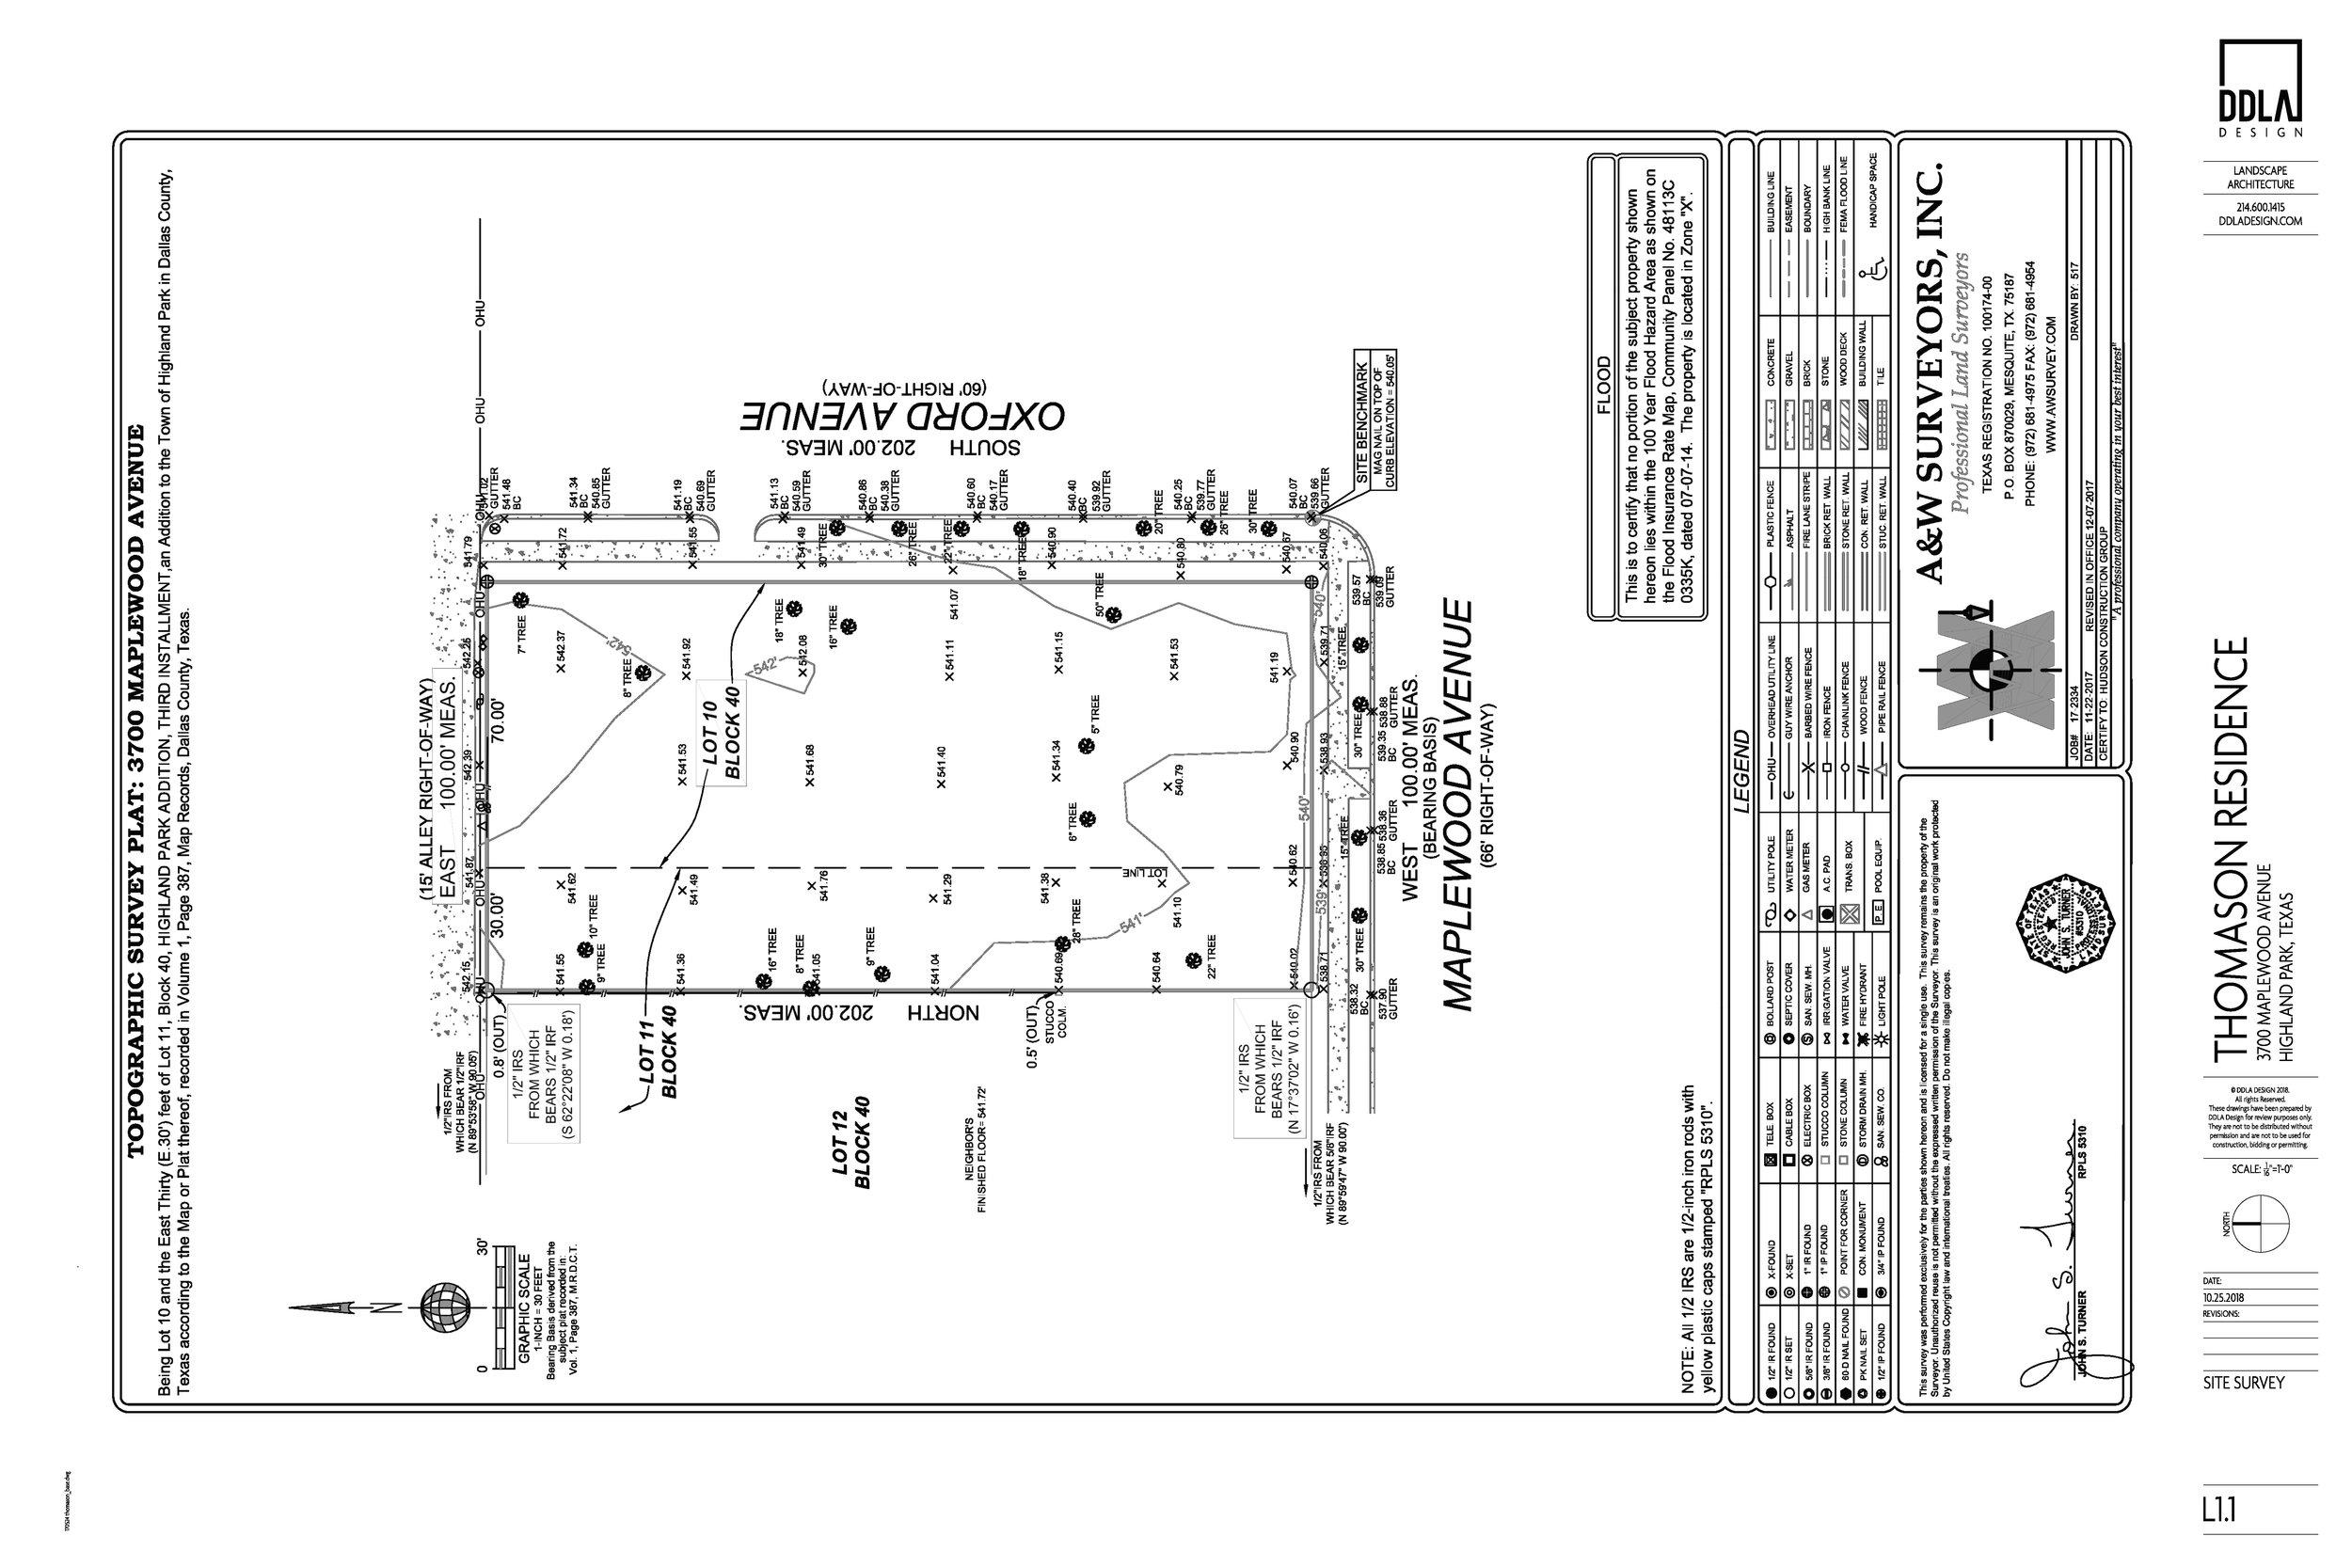 190319 thomason_revised cd set_Page_03.jpg